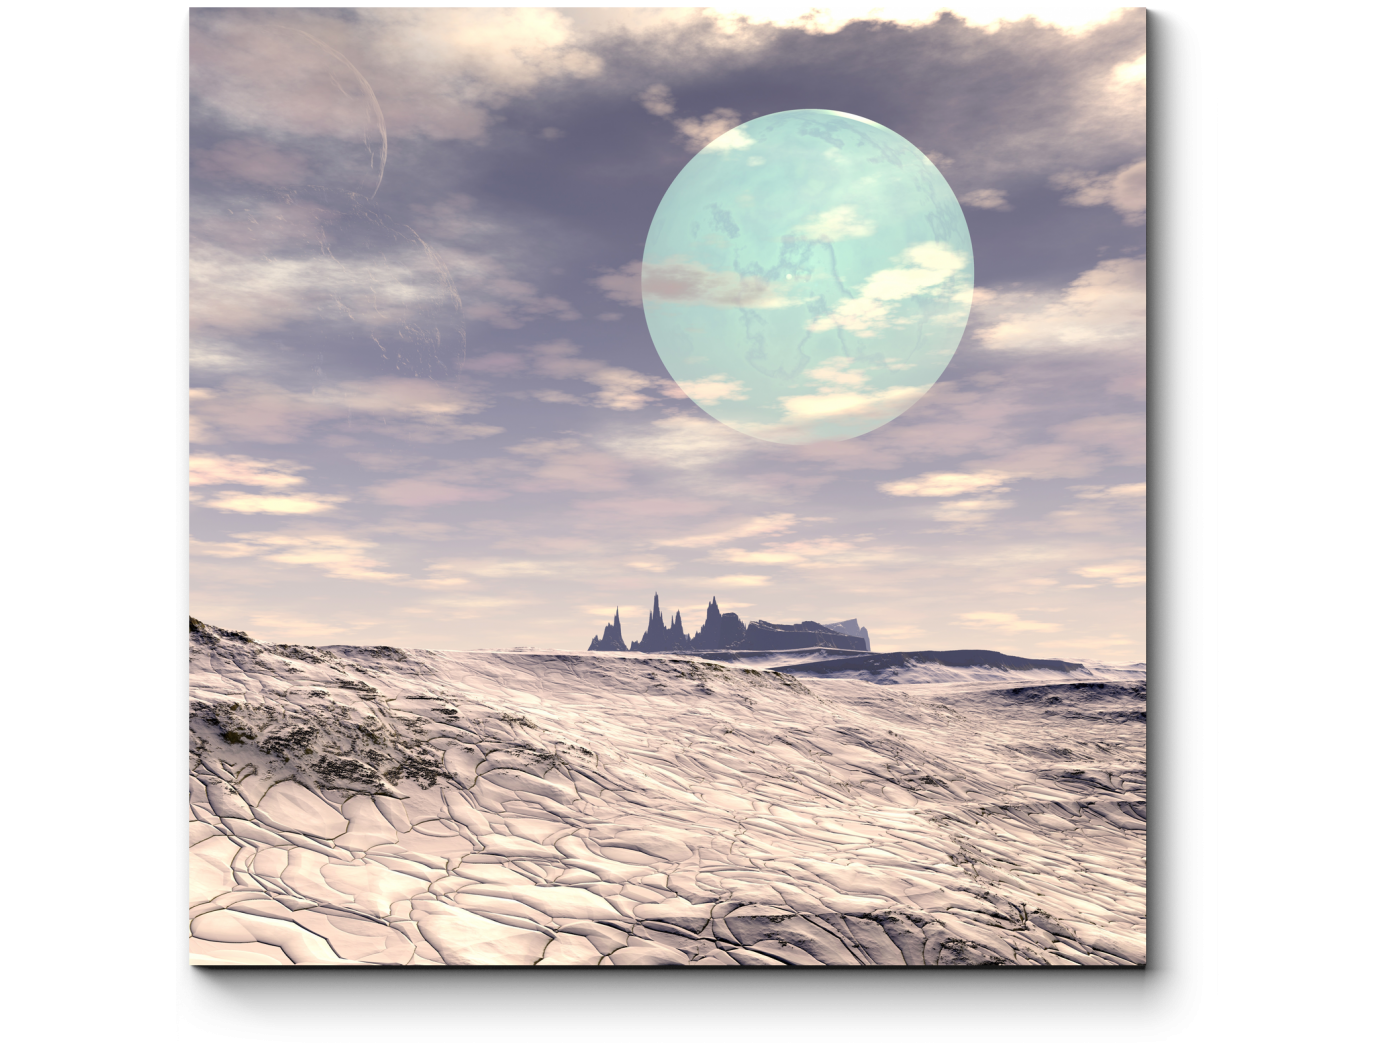 Модульная картина Циферблат (20x20) фото